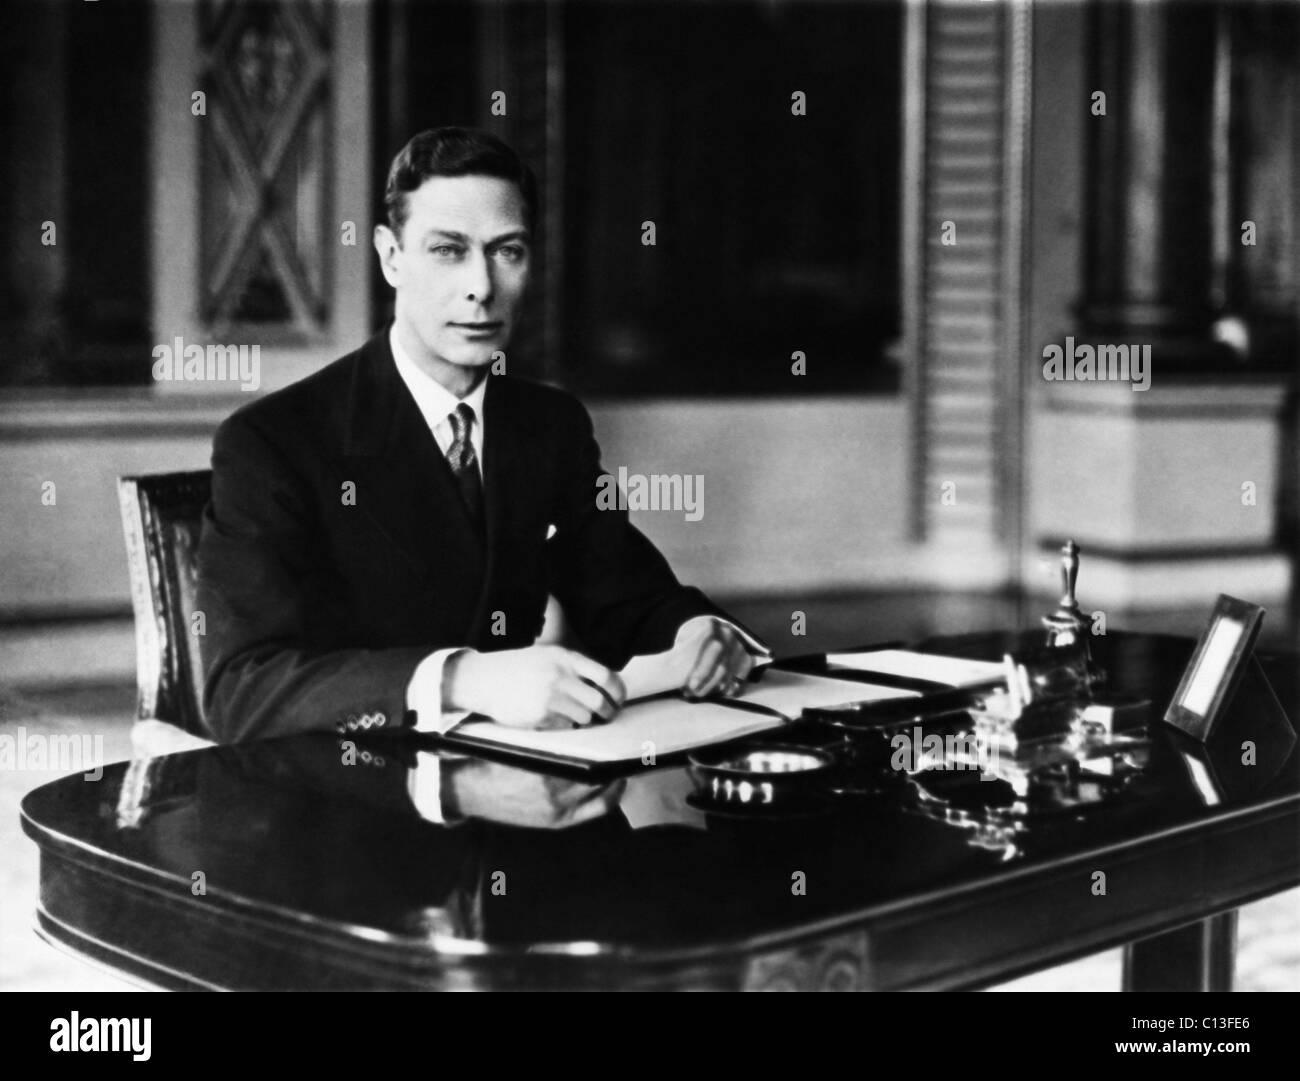 British Royalty. King George VI of England, 1937. Stock Photo